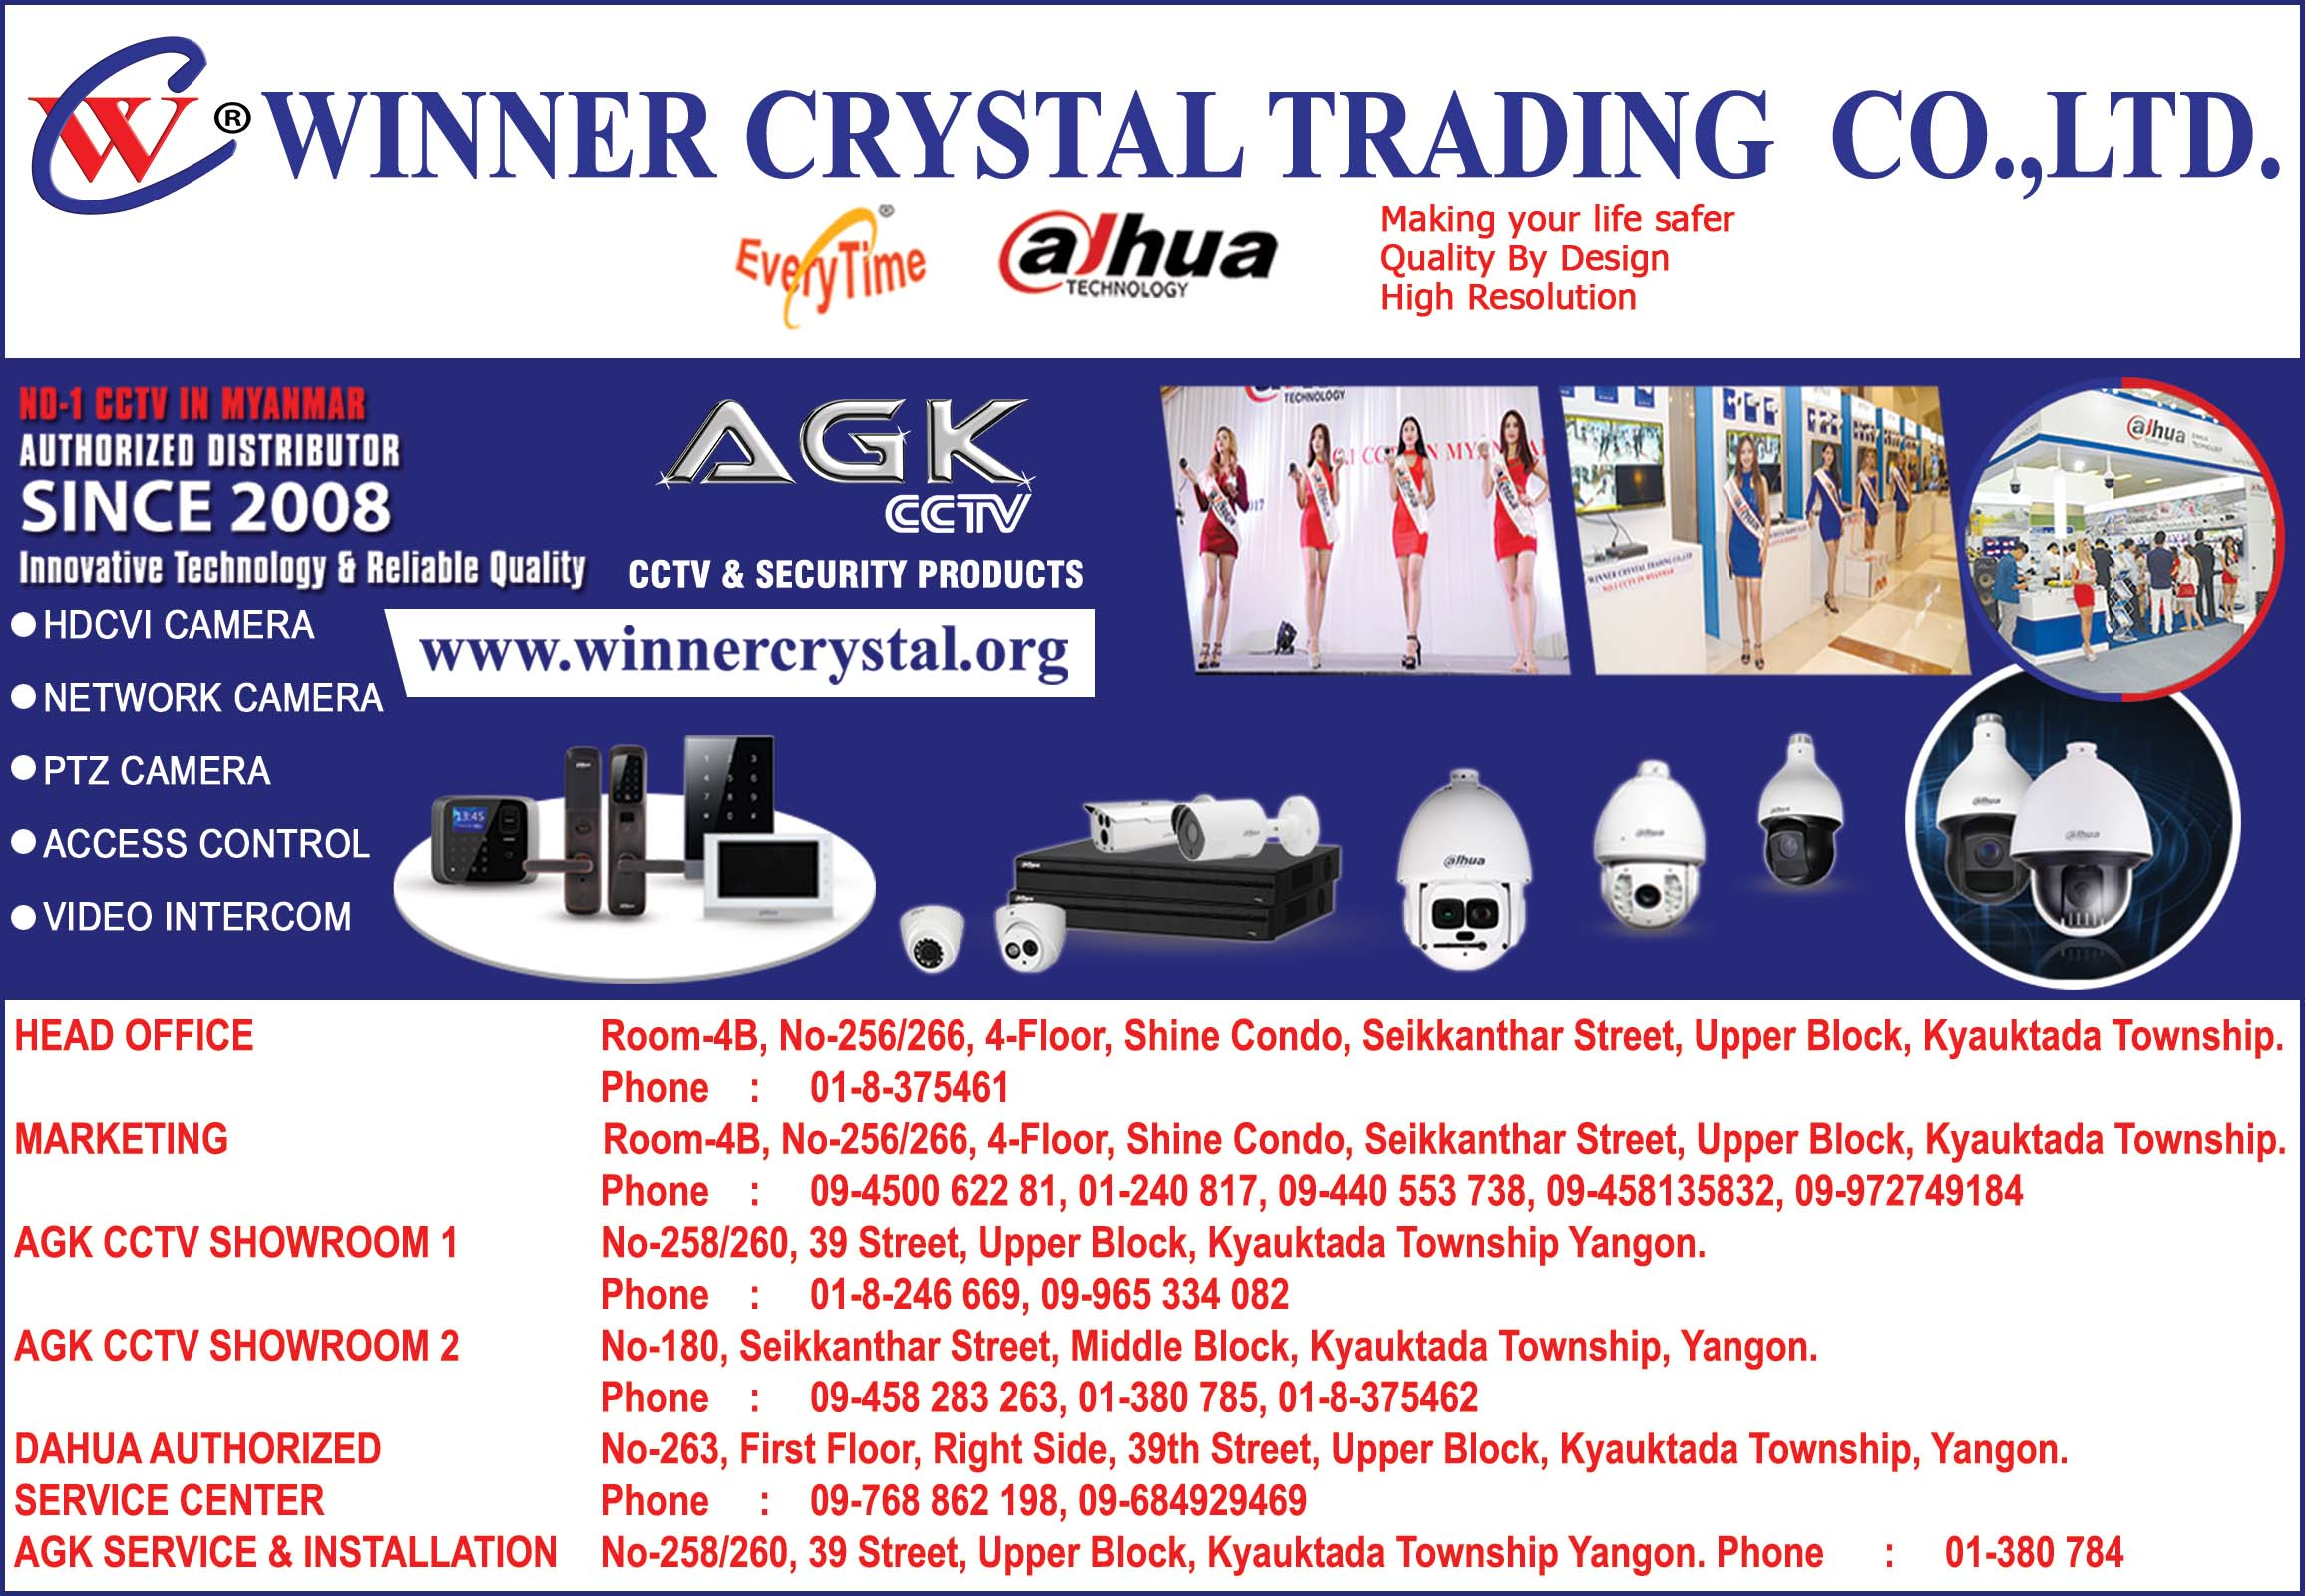 Winner Crystal Trading Co., Ltd.